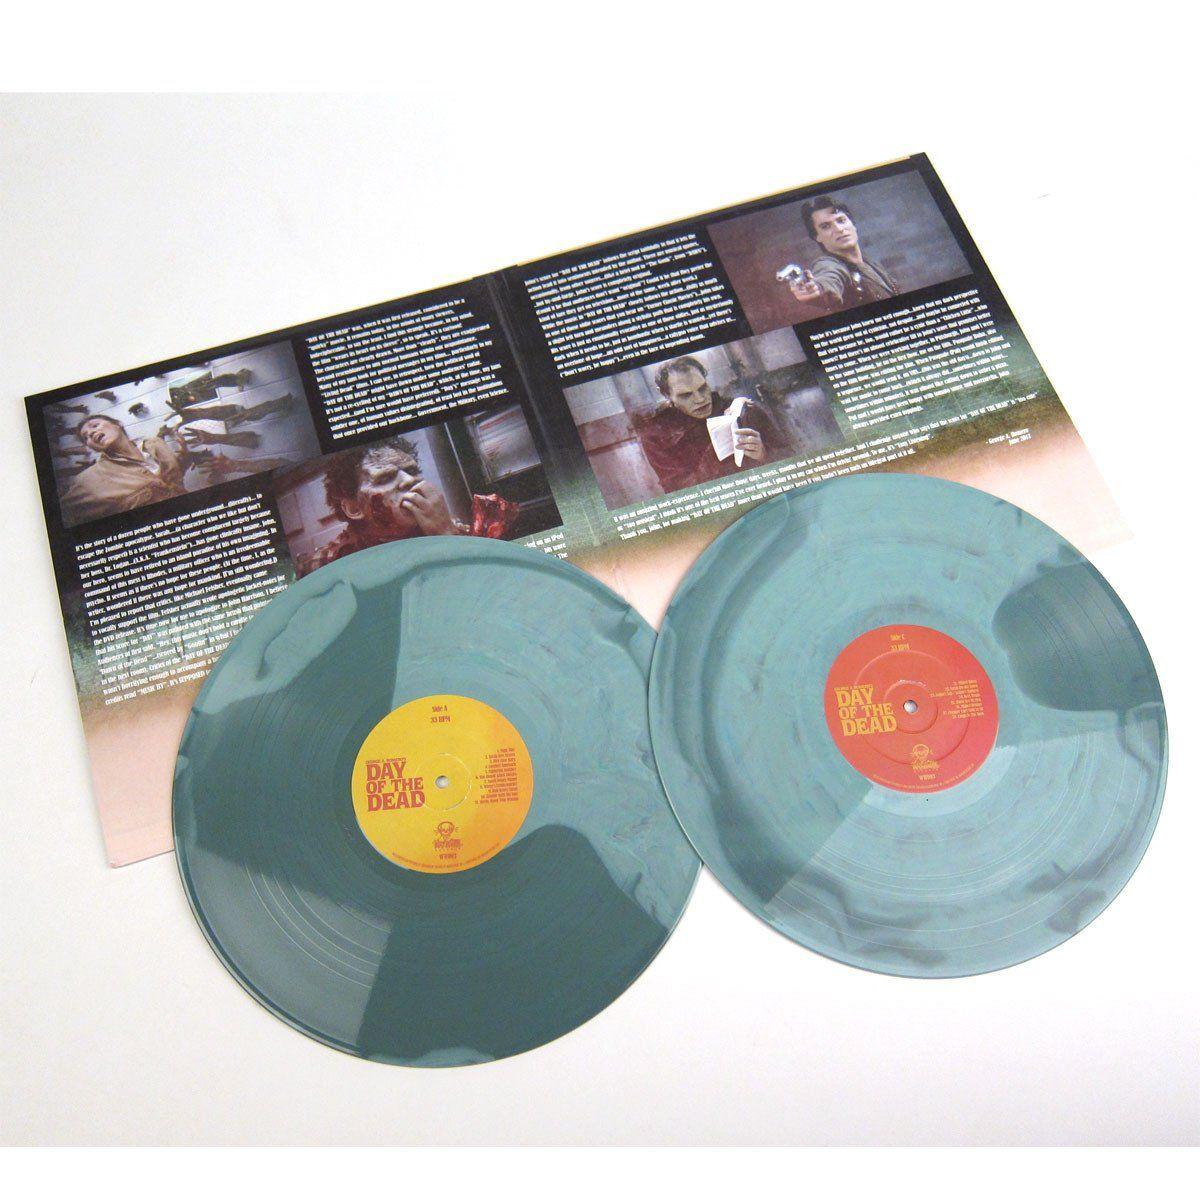 John Harrison George A Romero S Day Of The Dead Ost 180g Colored Vinyl Vinyl 2lp Vinyl Album Art John Harrison Vinyl